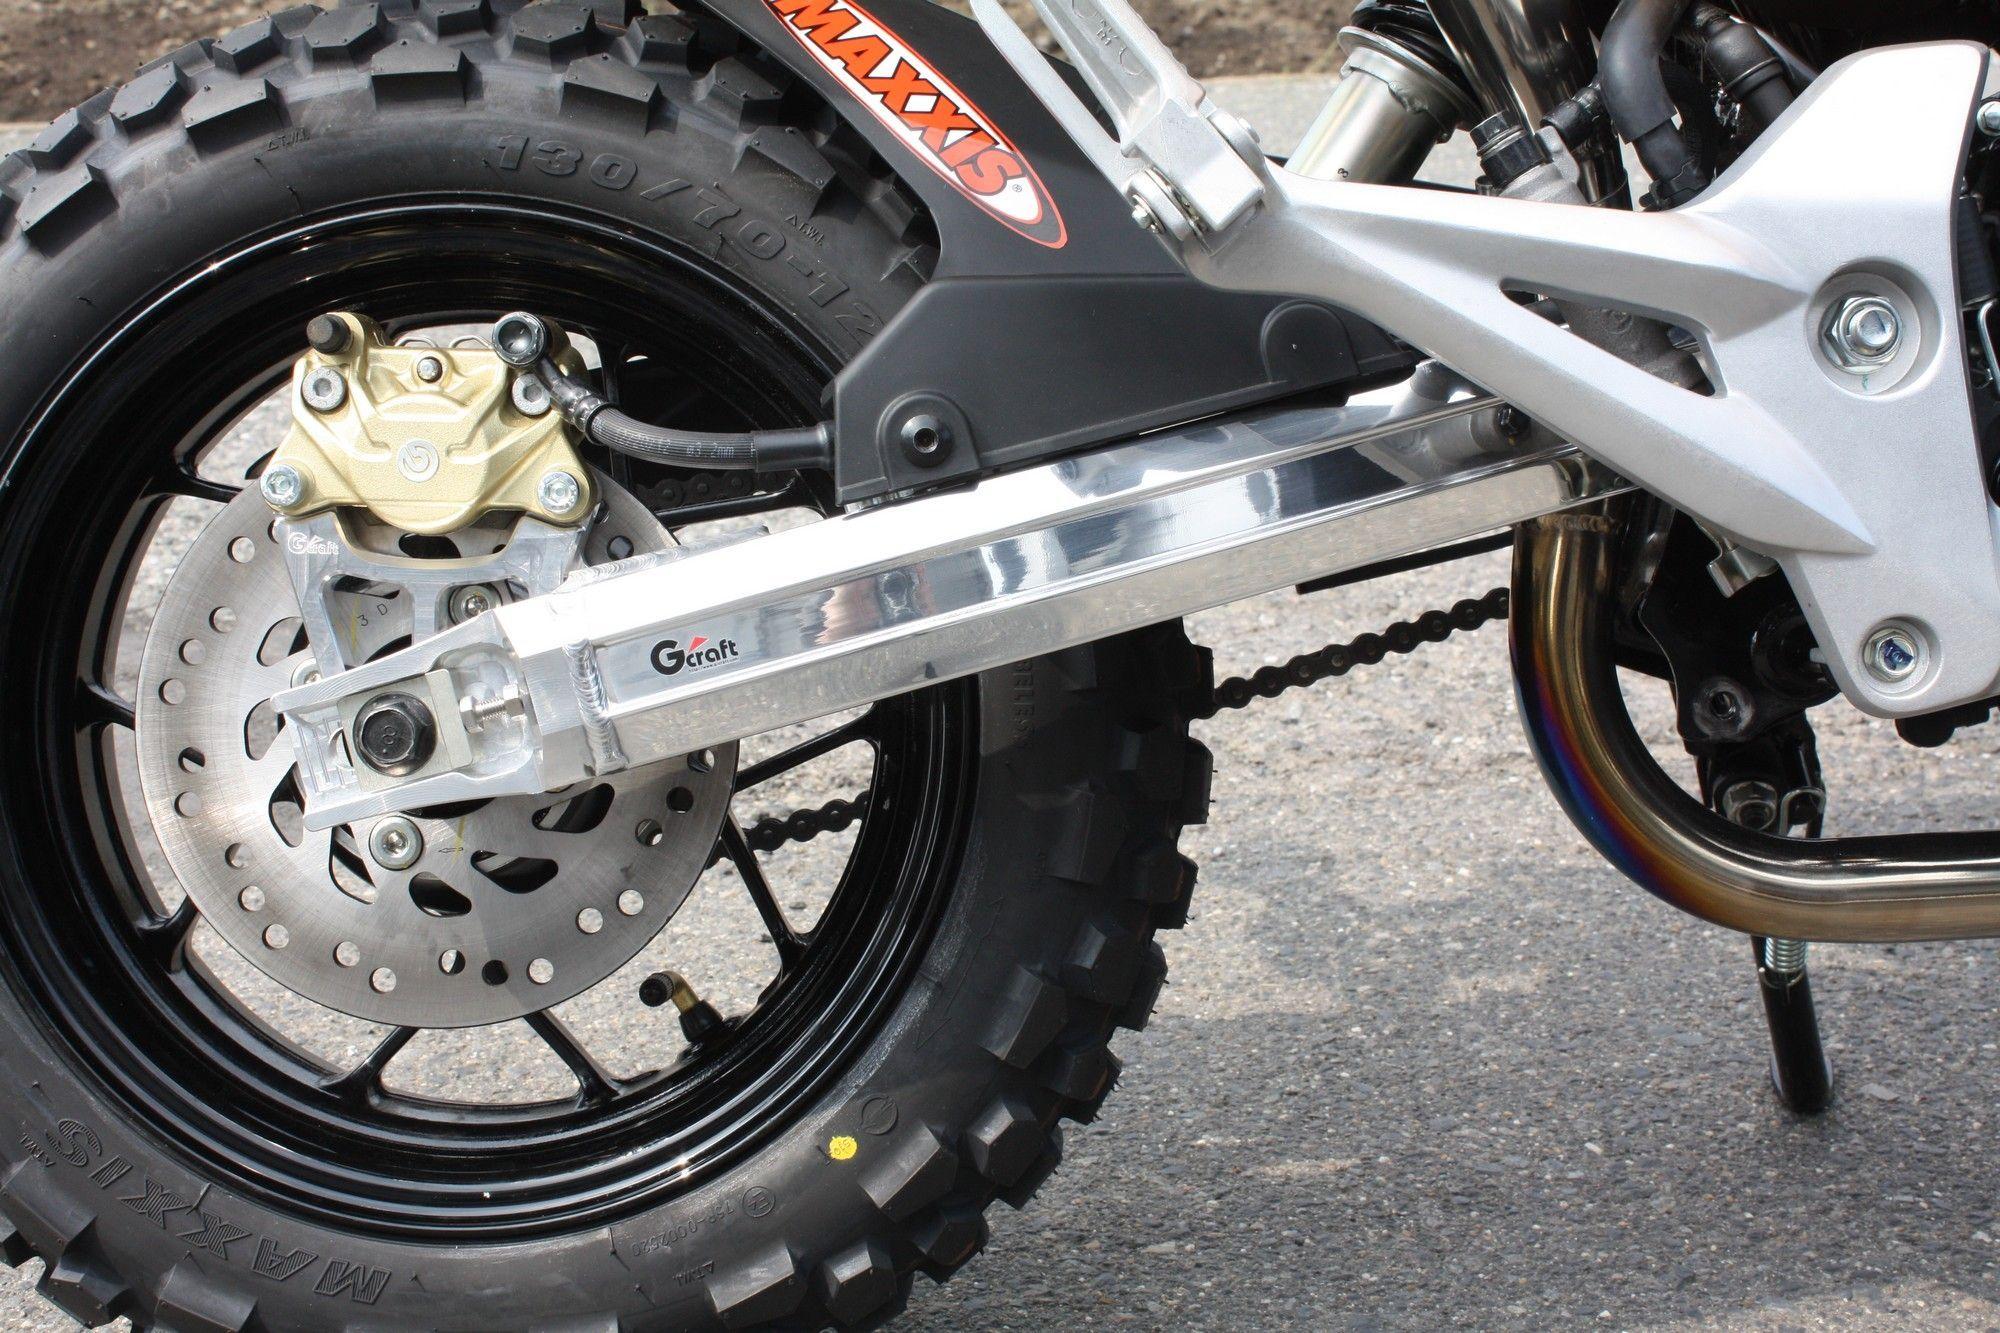 【G-Craft】GROM專用標準型後搖臂 (附平衡支架) - 「Webike-摩托百貨」